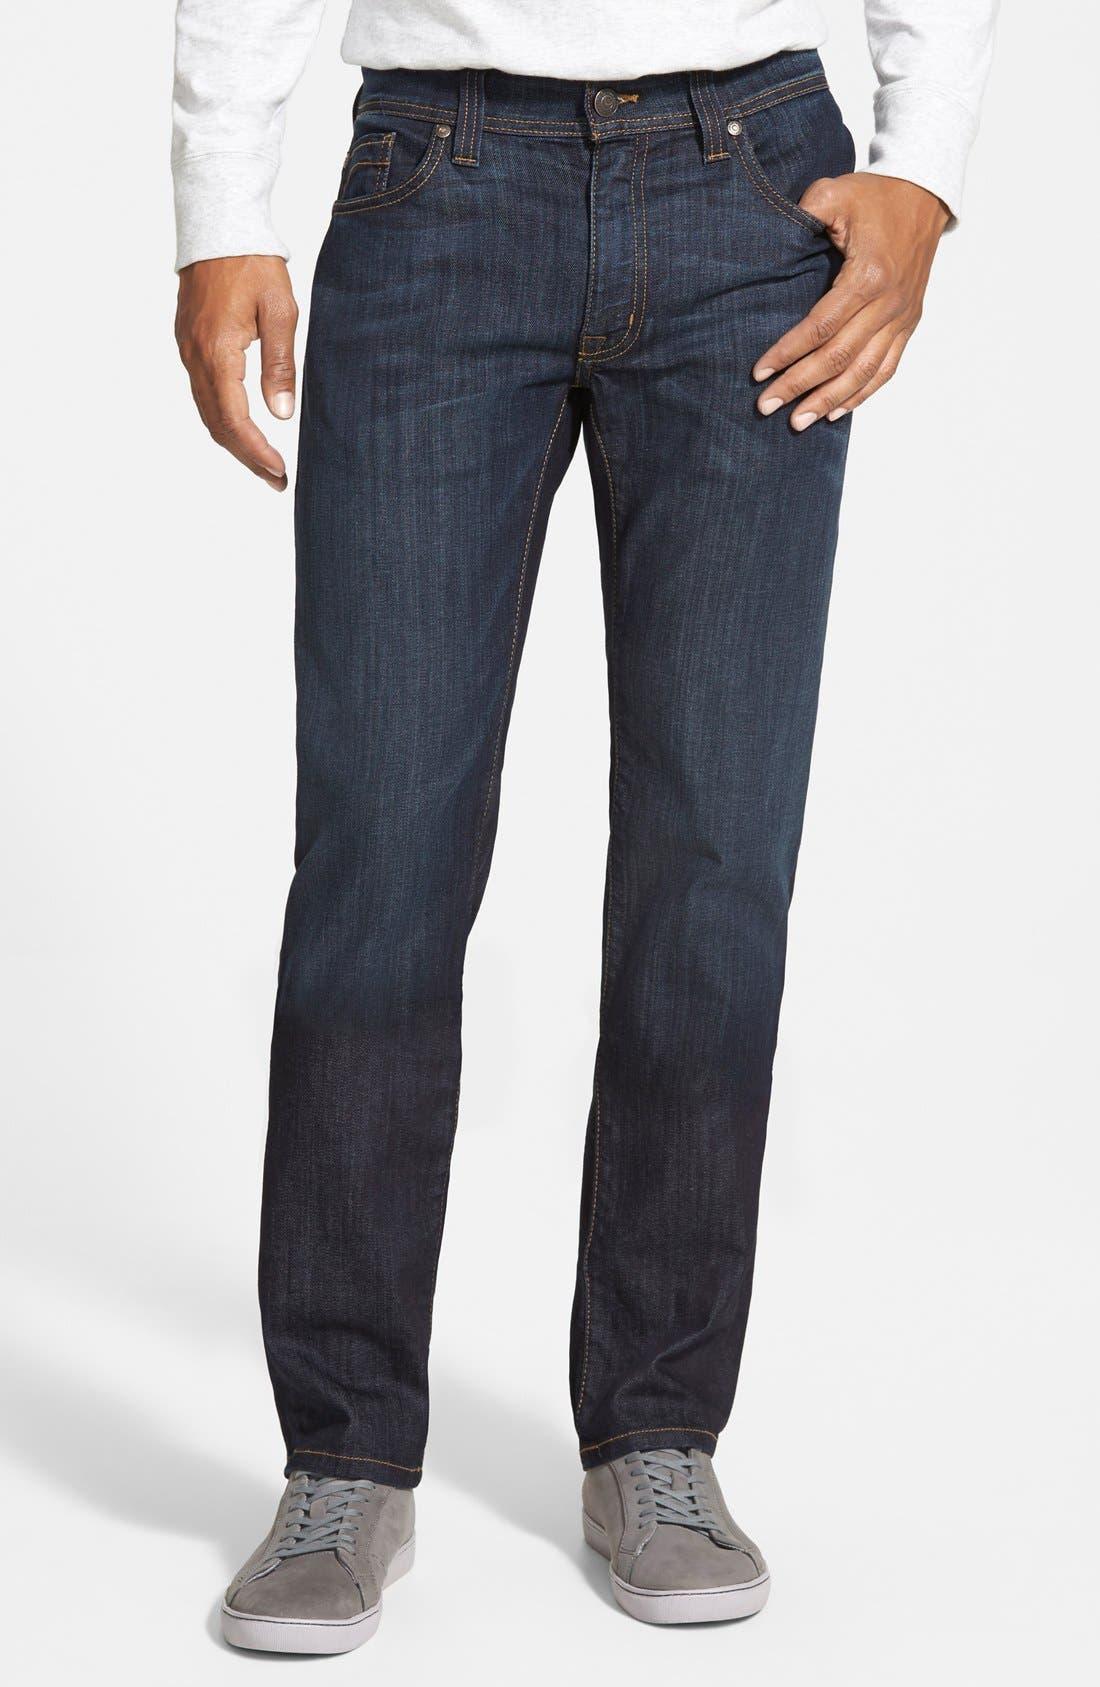 Fidelity Denim Jimmy Slim Straight Leg Jeans (Clampdown Dark)